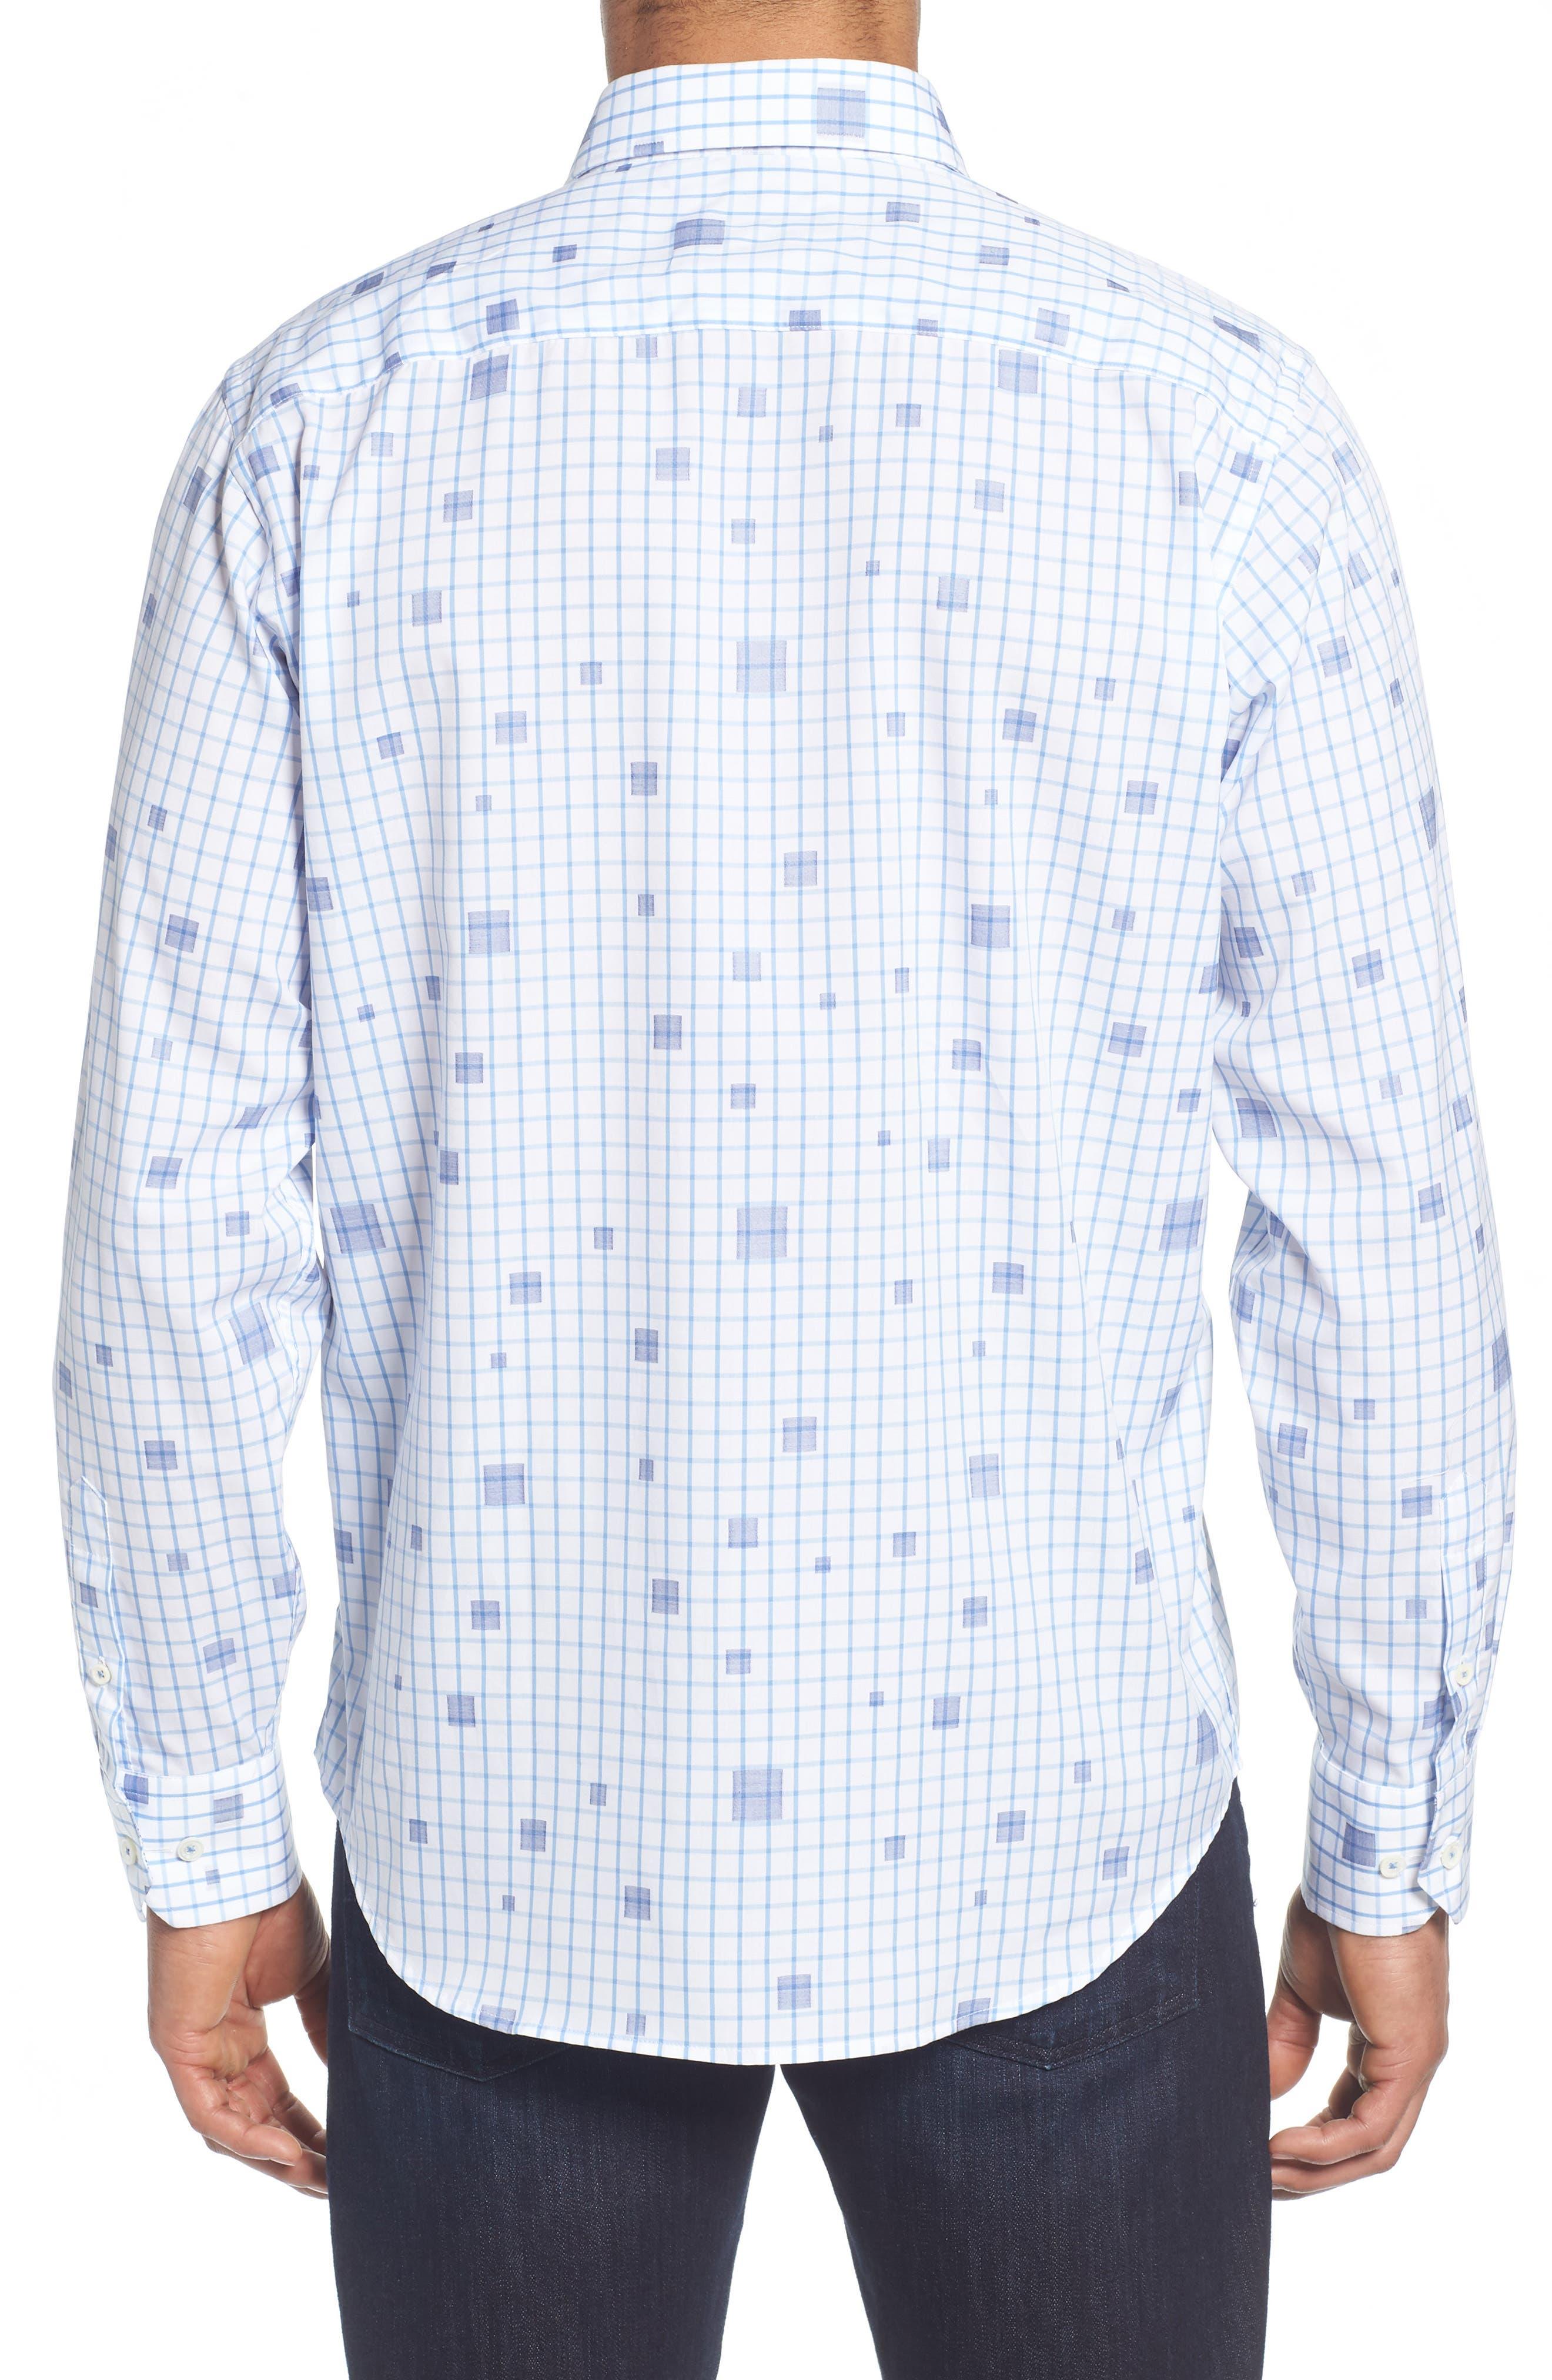 Classic Fit Square Check Sport Shirt,                             Alternate thumbnail 2, color,                             422